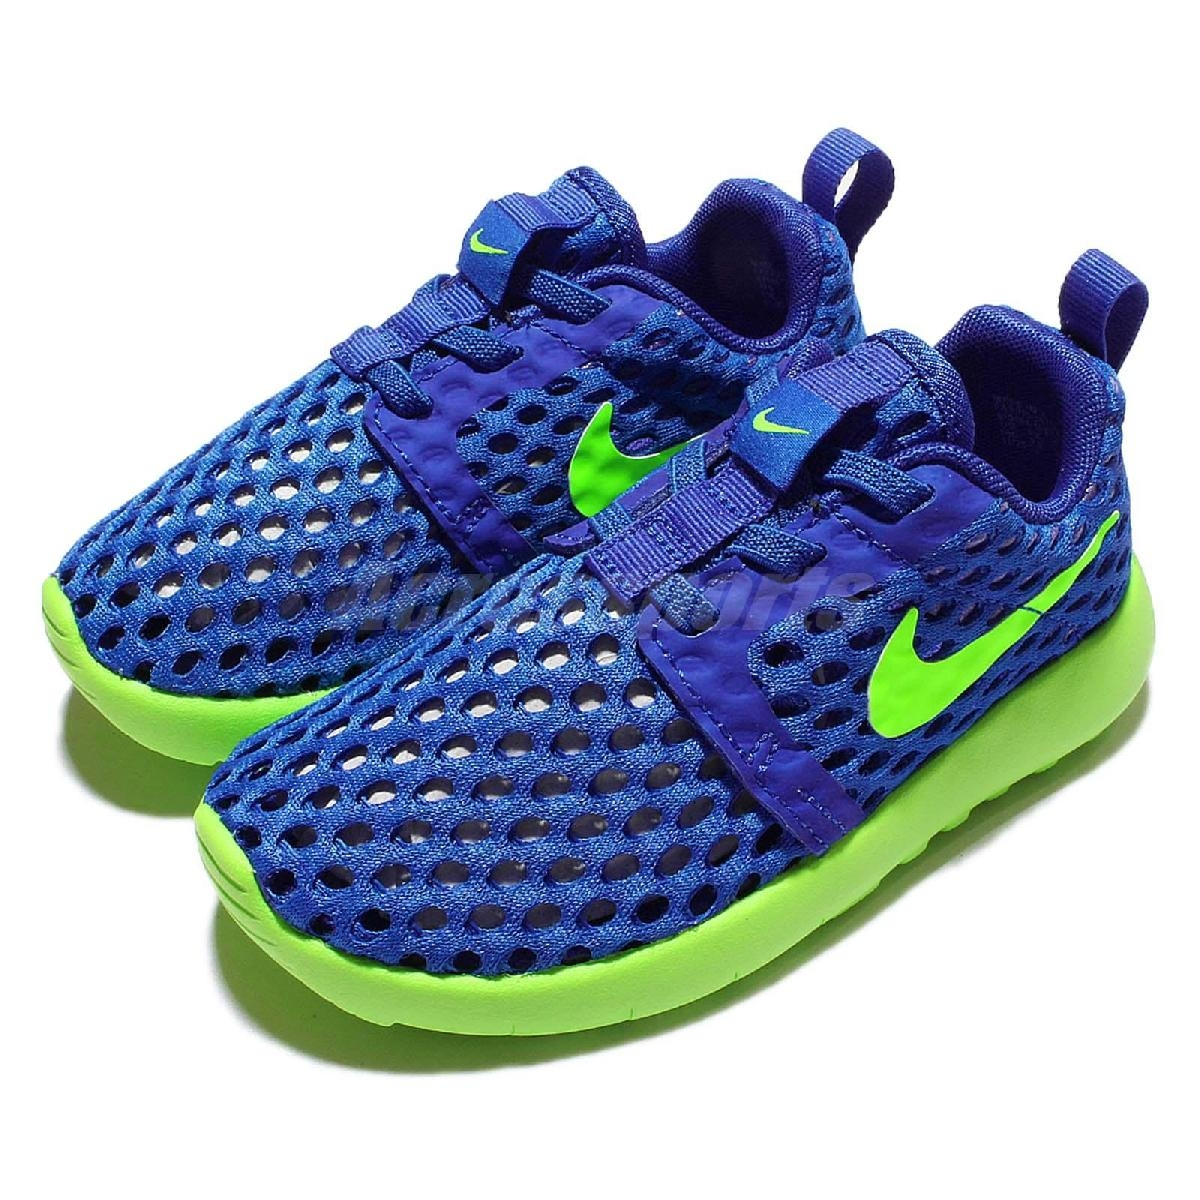 Nike休閒慢跑鞋Roshe One Flight Weight TDV藍綠運動鞋小朋友小童鞋PUMP306 819691-404